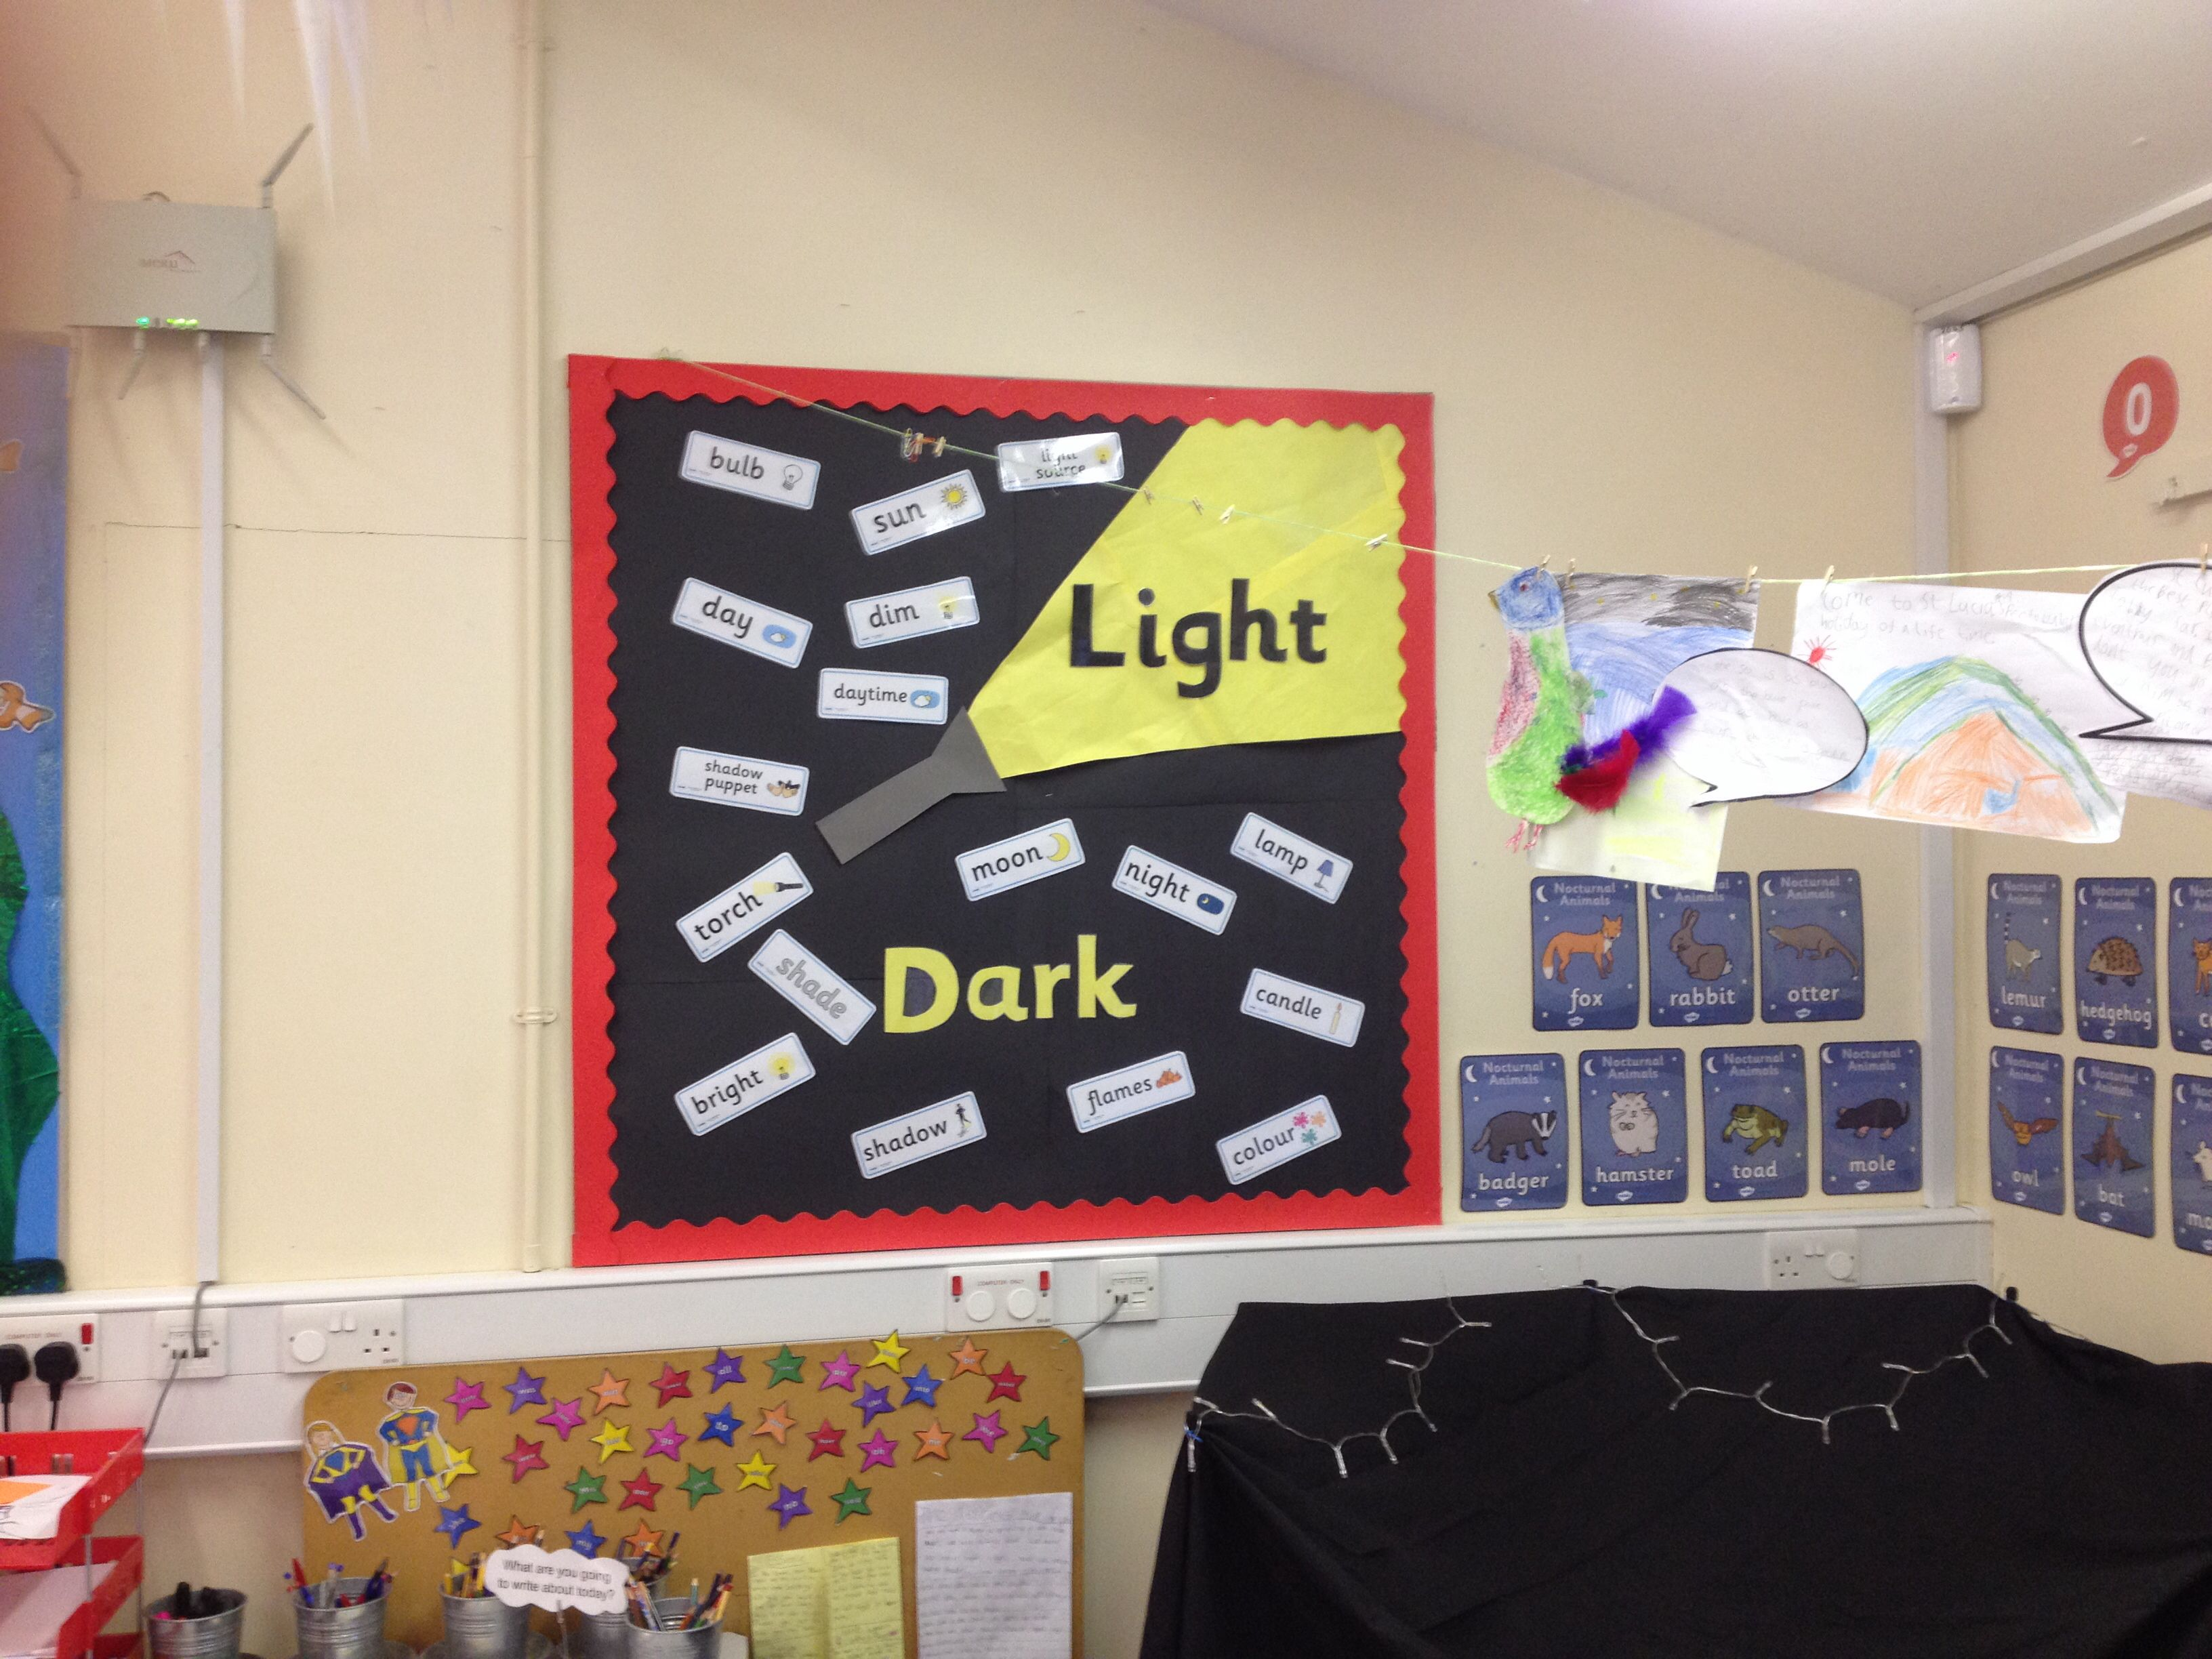 Classroom Lighting Ideas : Light and dark display classroom ideas pinterest